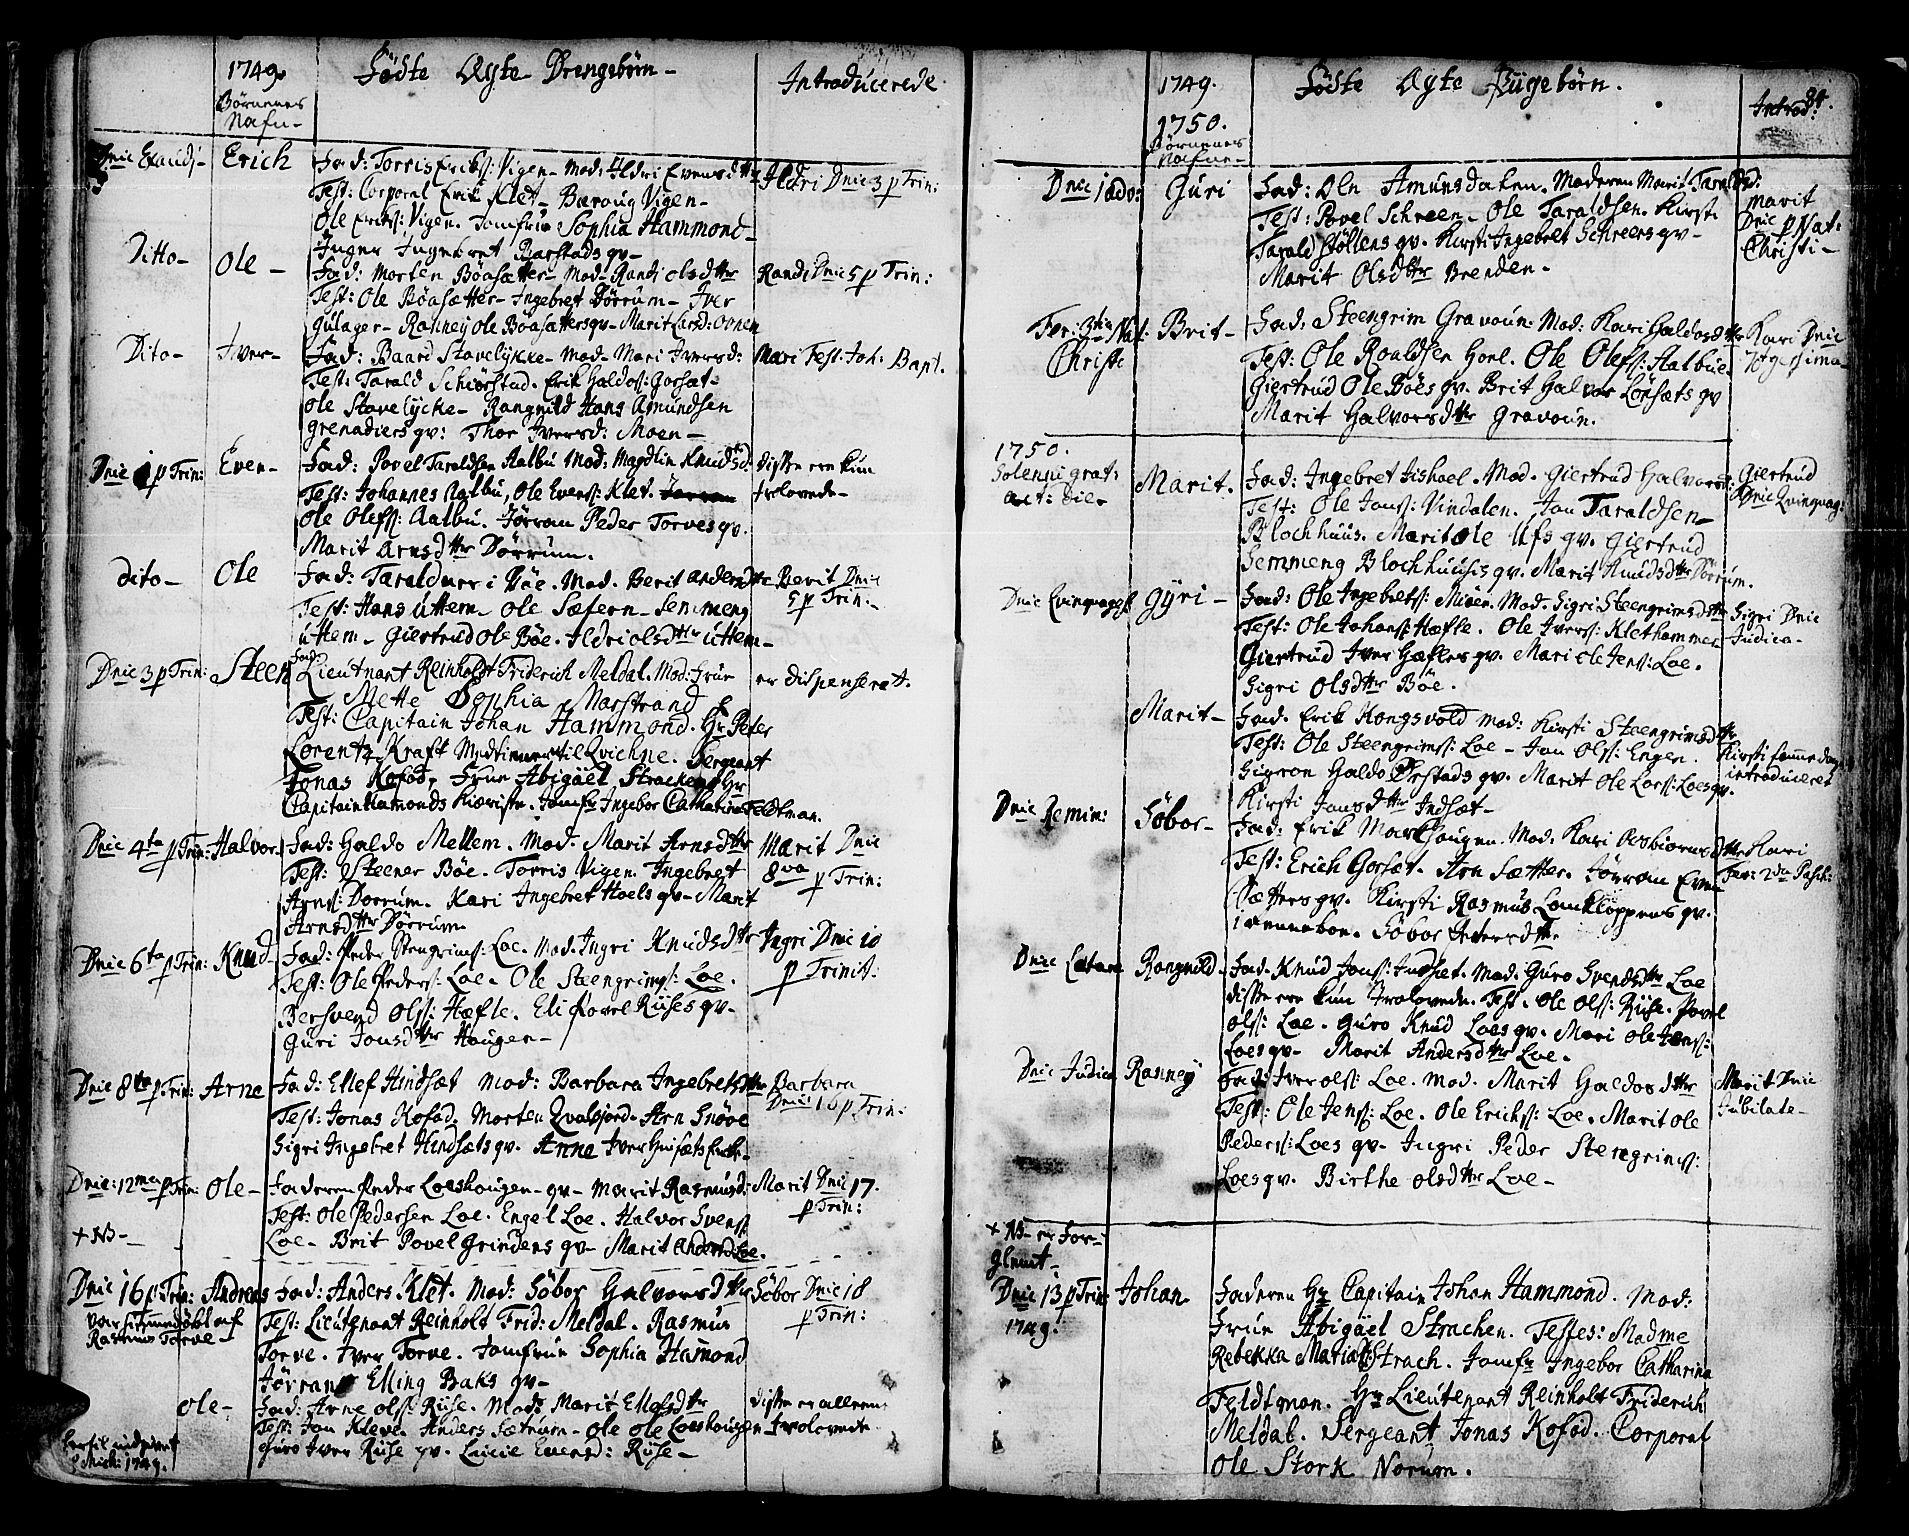 SAT, Ministerialprotokoller, klokkerbøker og fødselsregistre - Sør-Trøndelag, 678/L0891: Parish register (official) no. 678A01, 1739-1780, p. 84